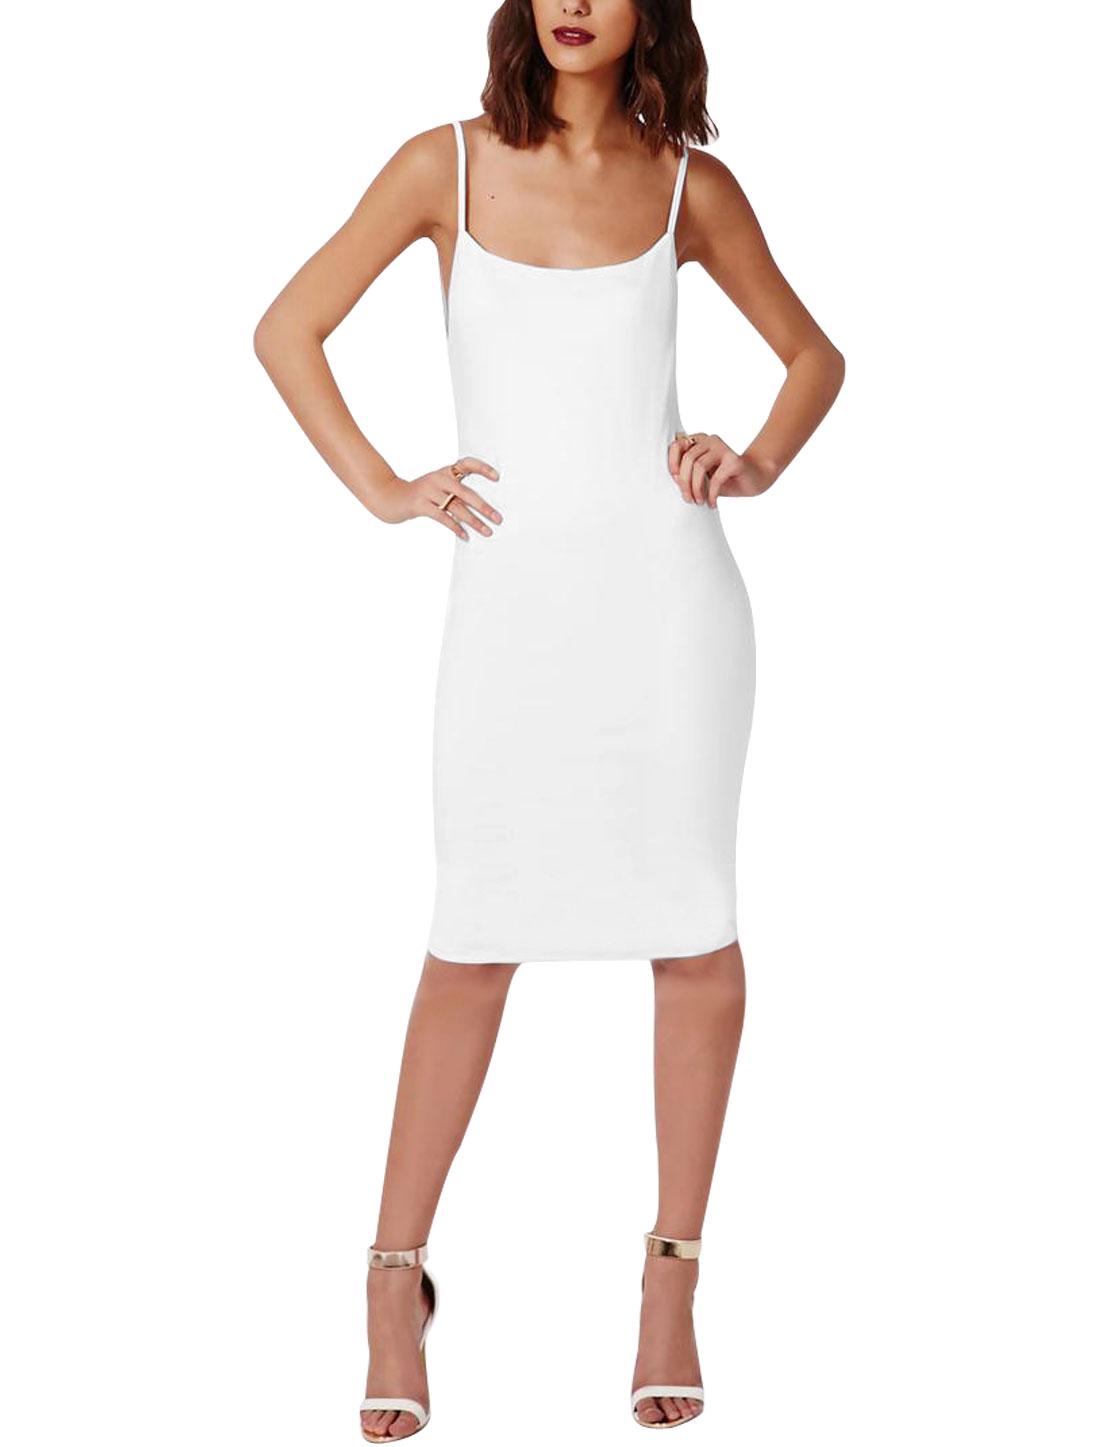 Women Scoop Neck Backless Full Lined Tight Dresses White L